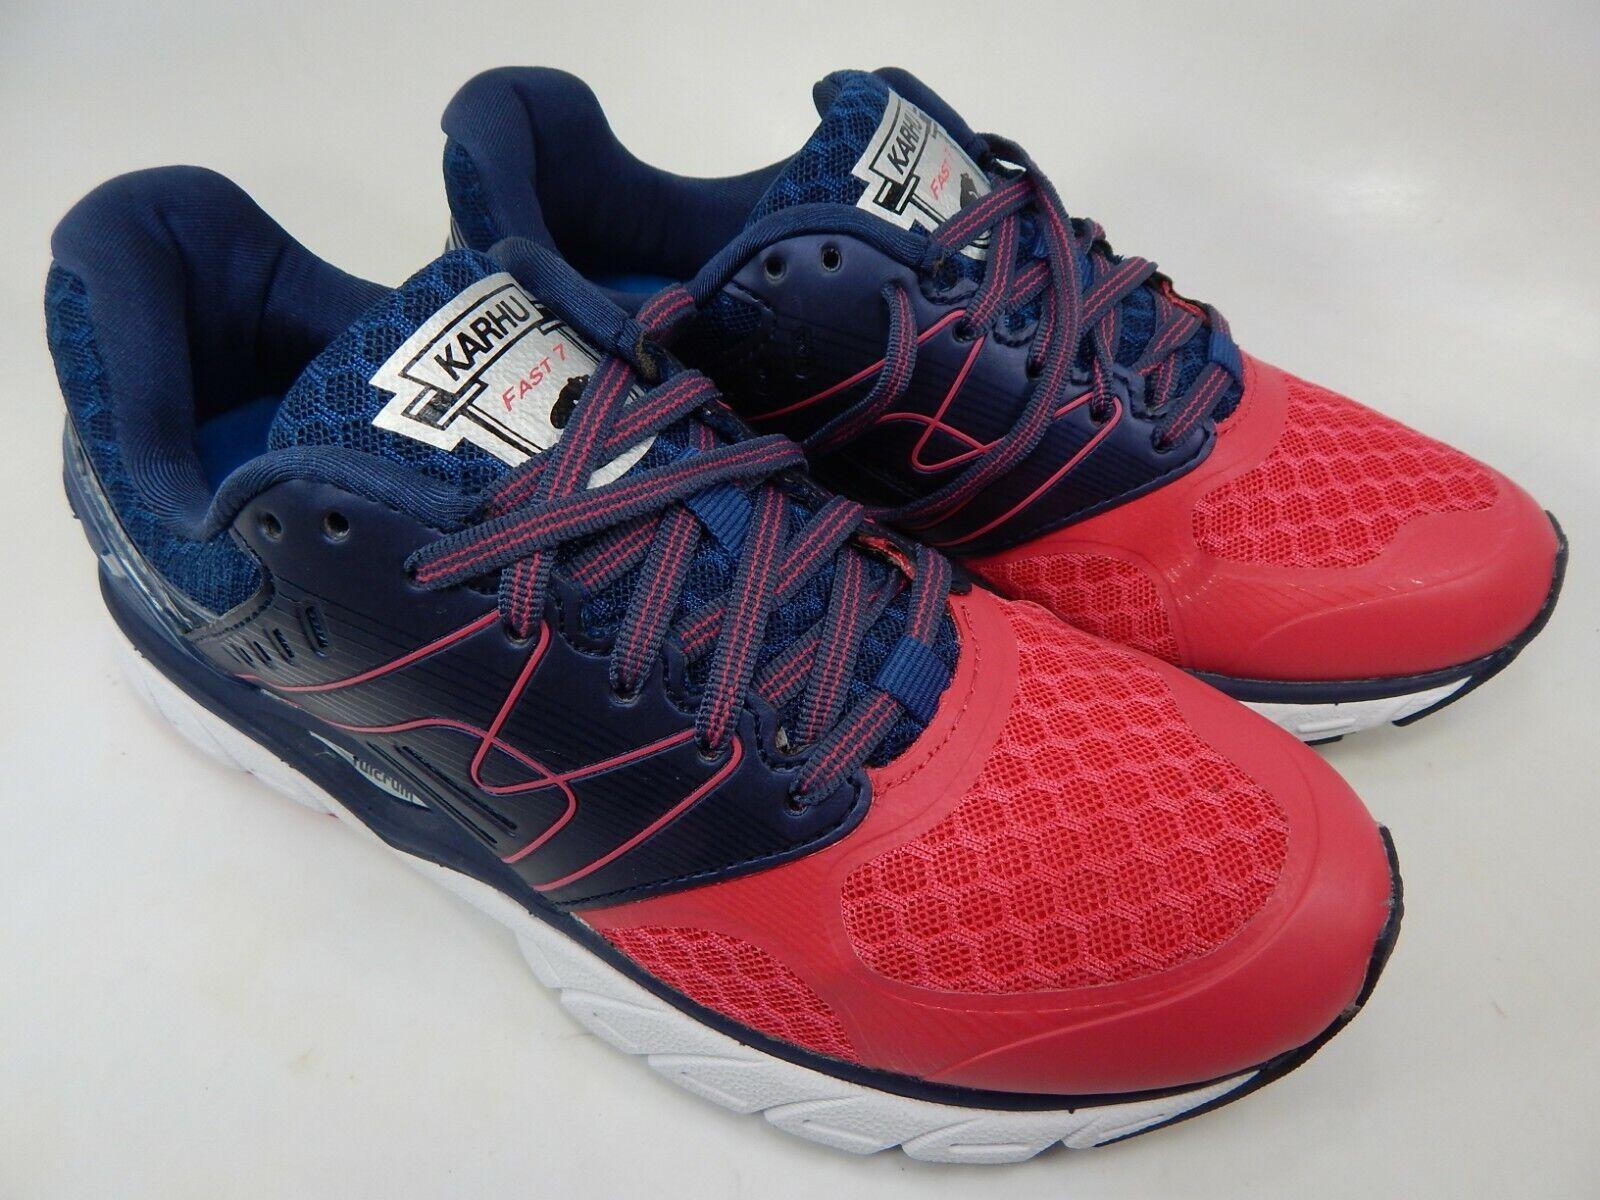 Karhu Fast 7 MRE Size US 7 M (B) EU 38 Women's Running shoes Red F200203